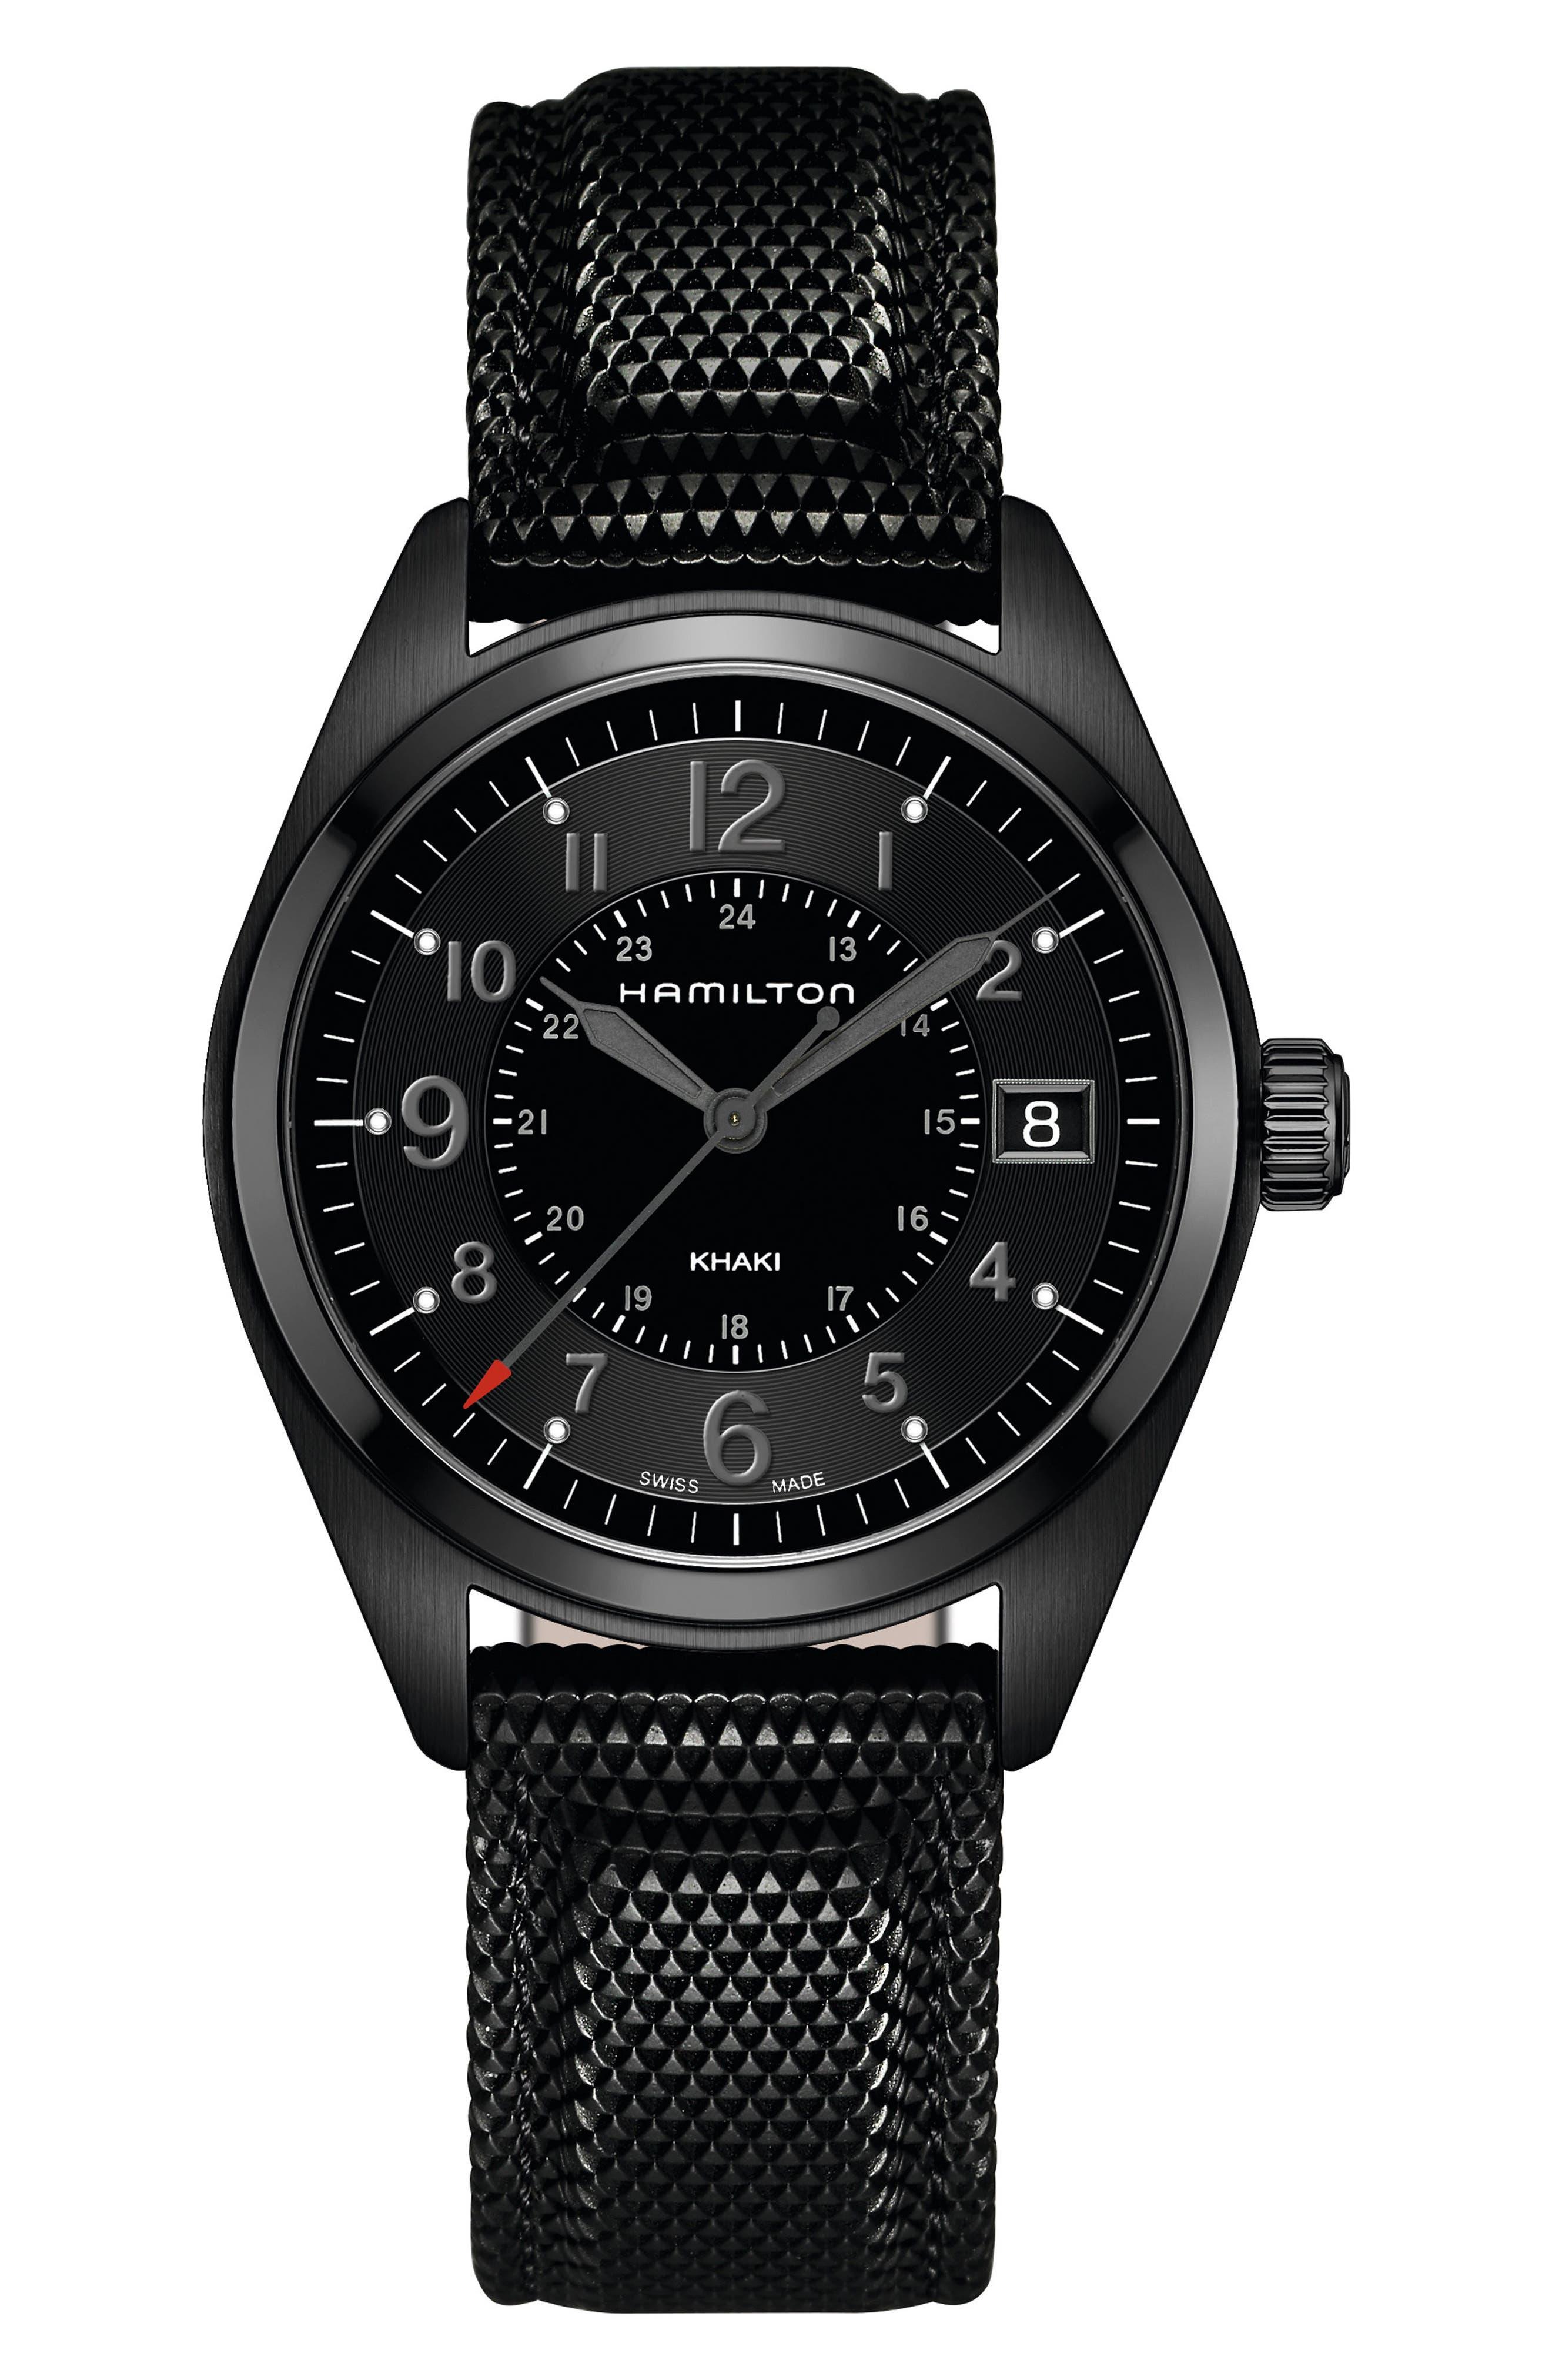 Khaki Field Silicone Strap Watch